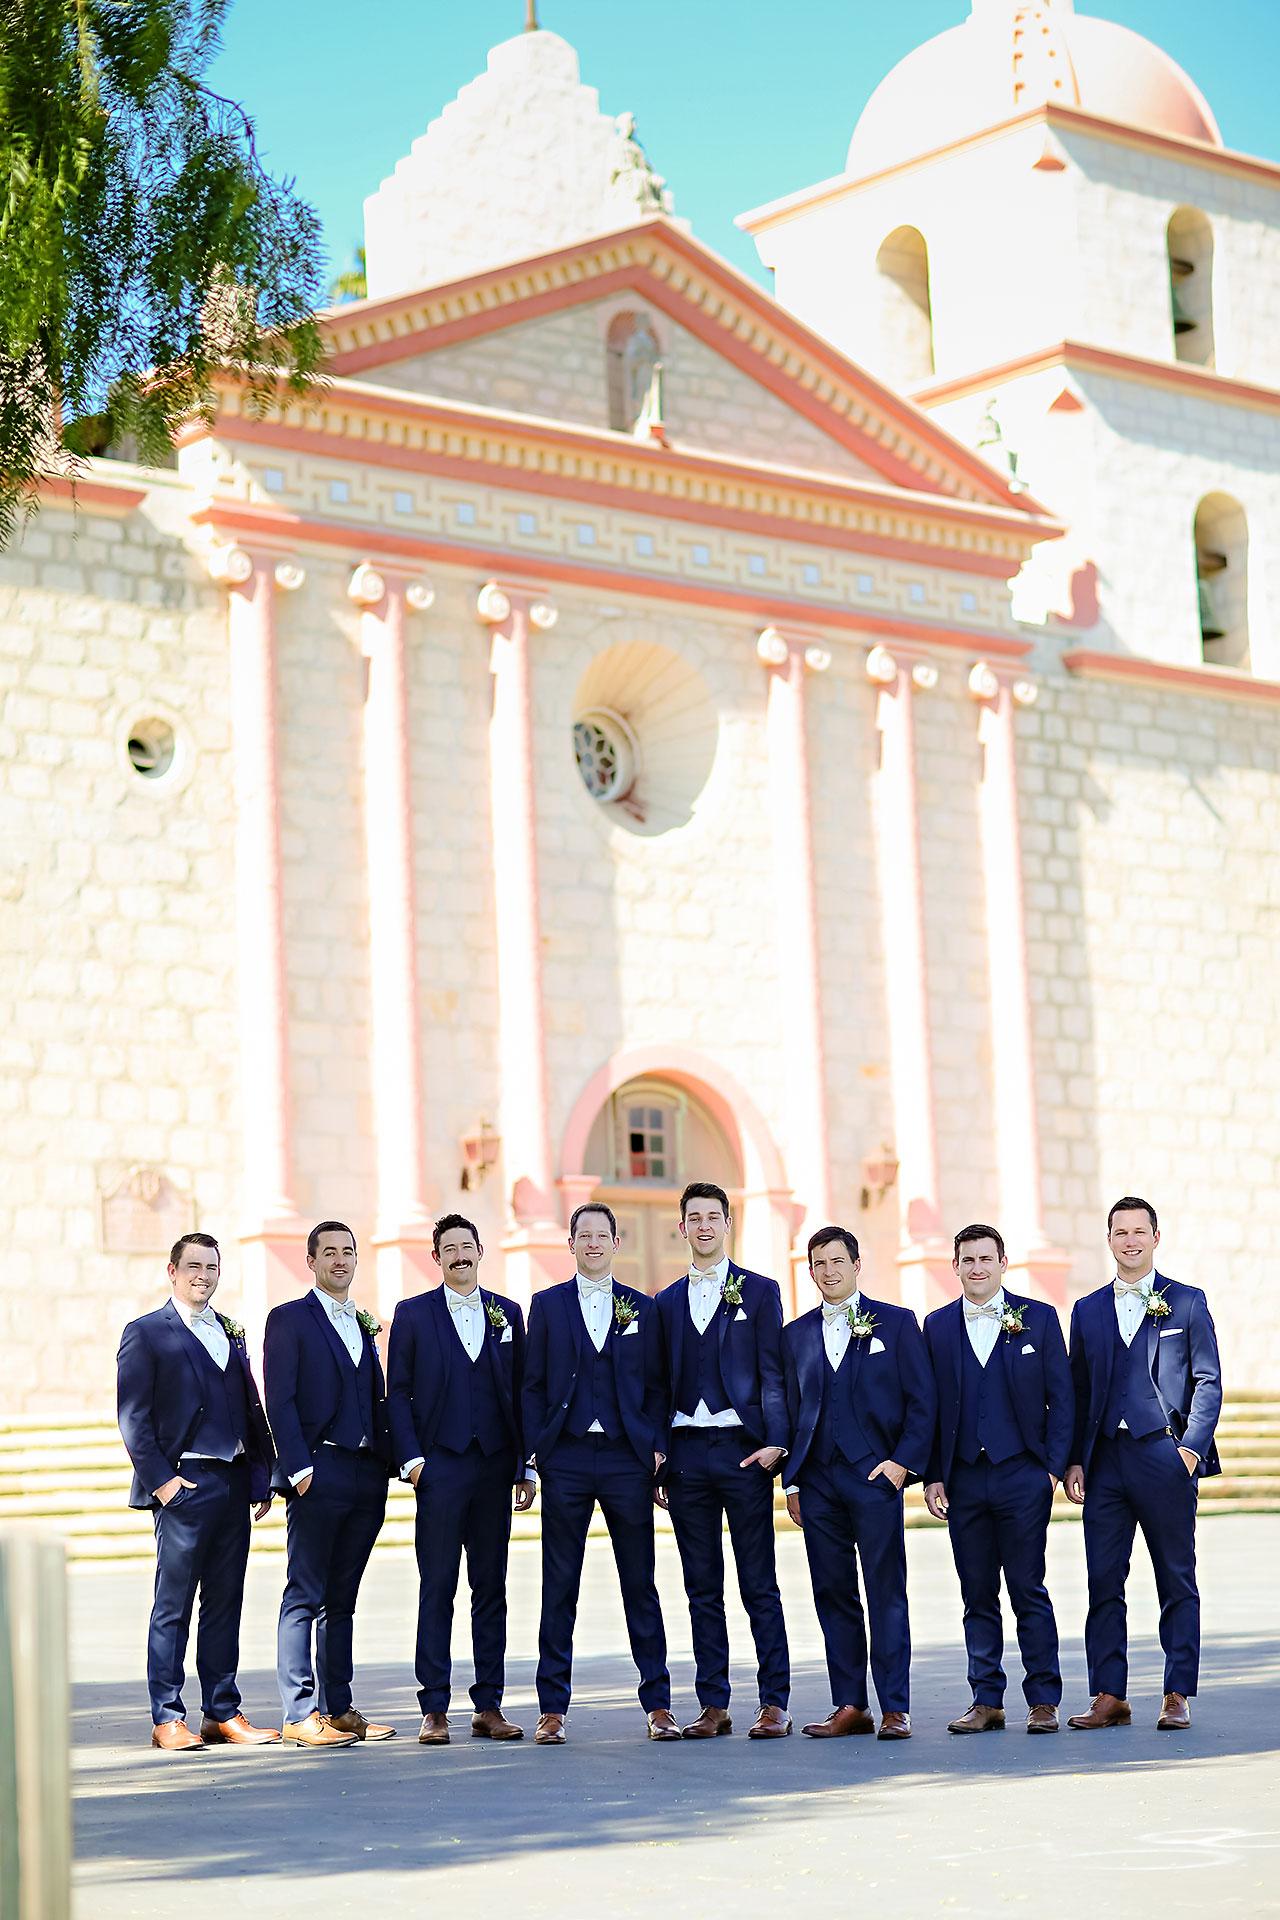 Kristin Darrin Santa Barbara Historical Museum Wedding 097